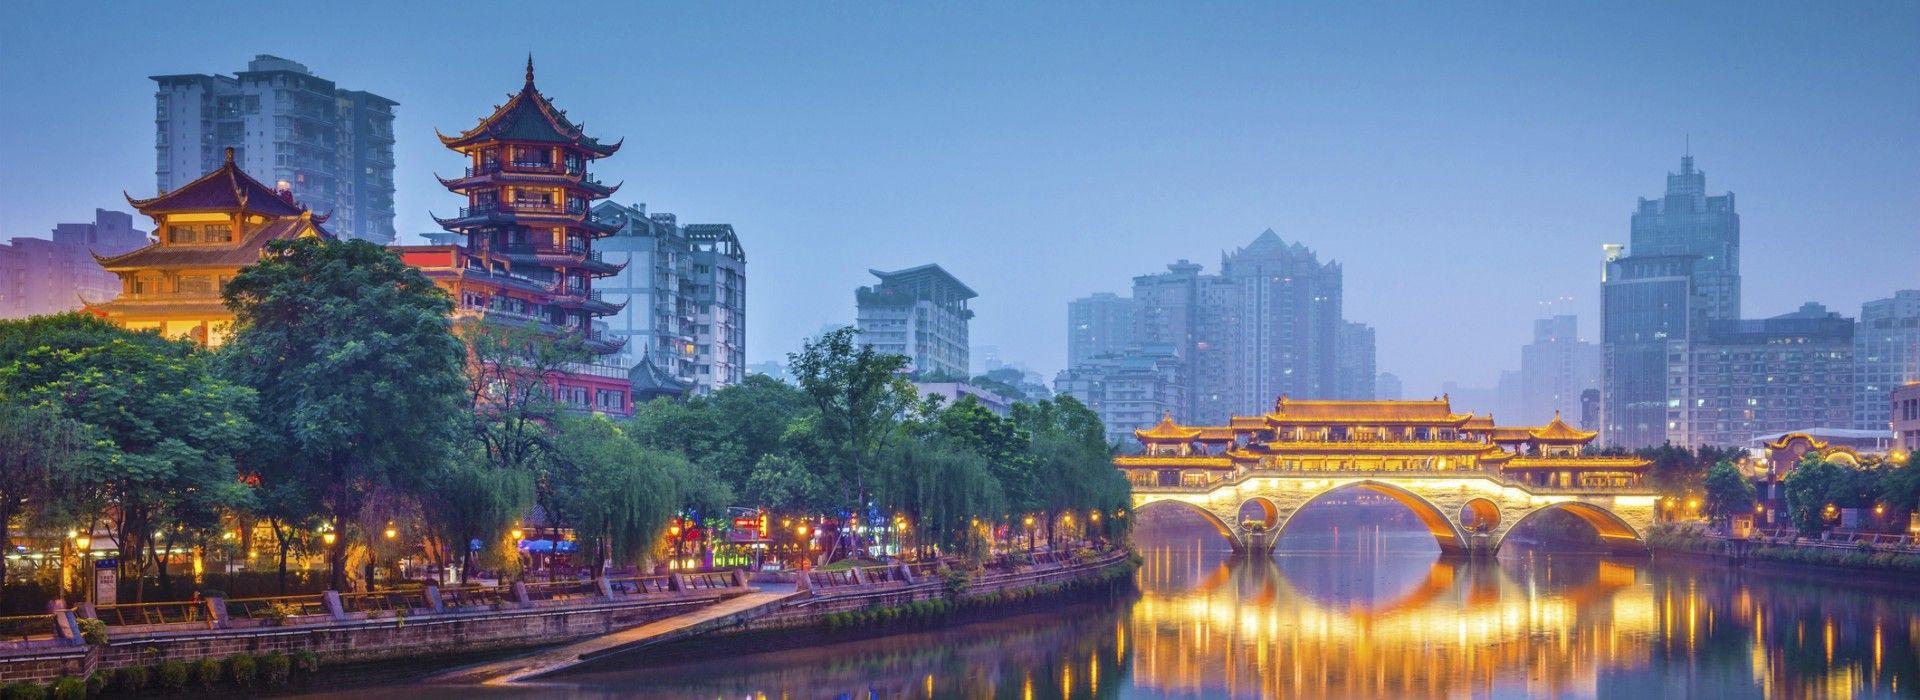 Chengdu Tours and Trips to Chengdu